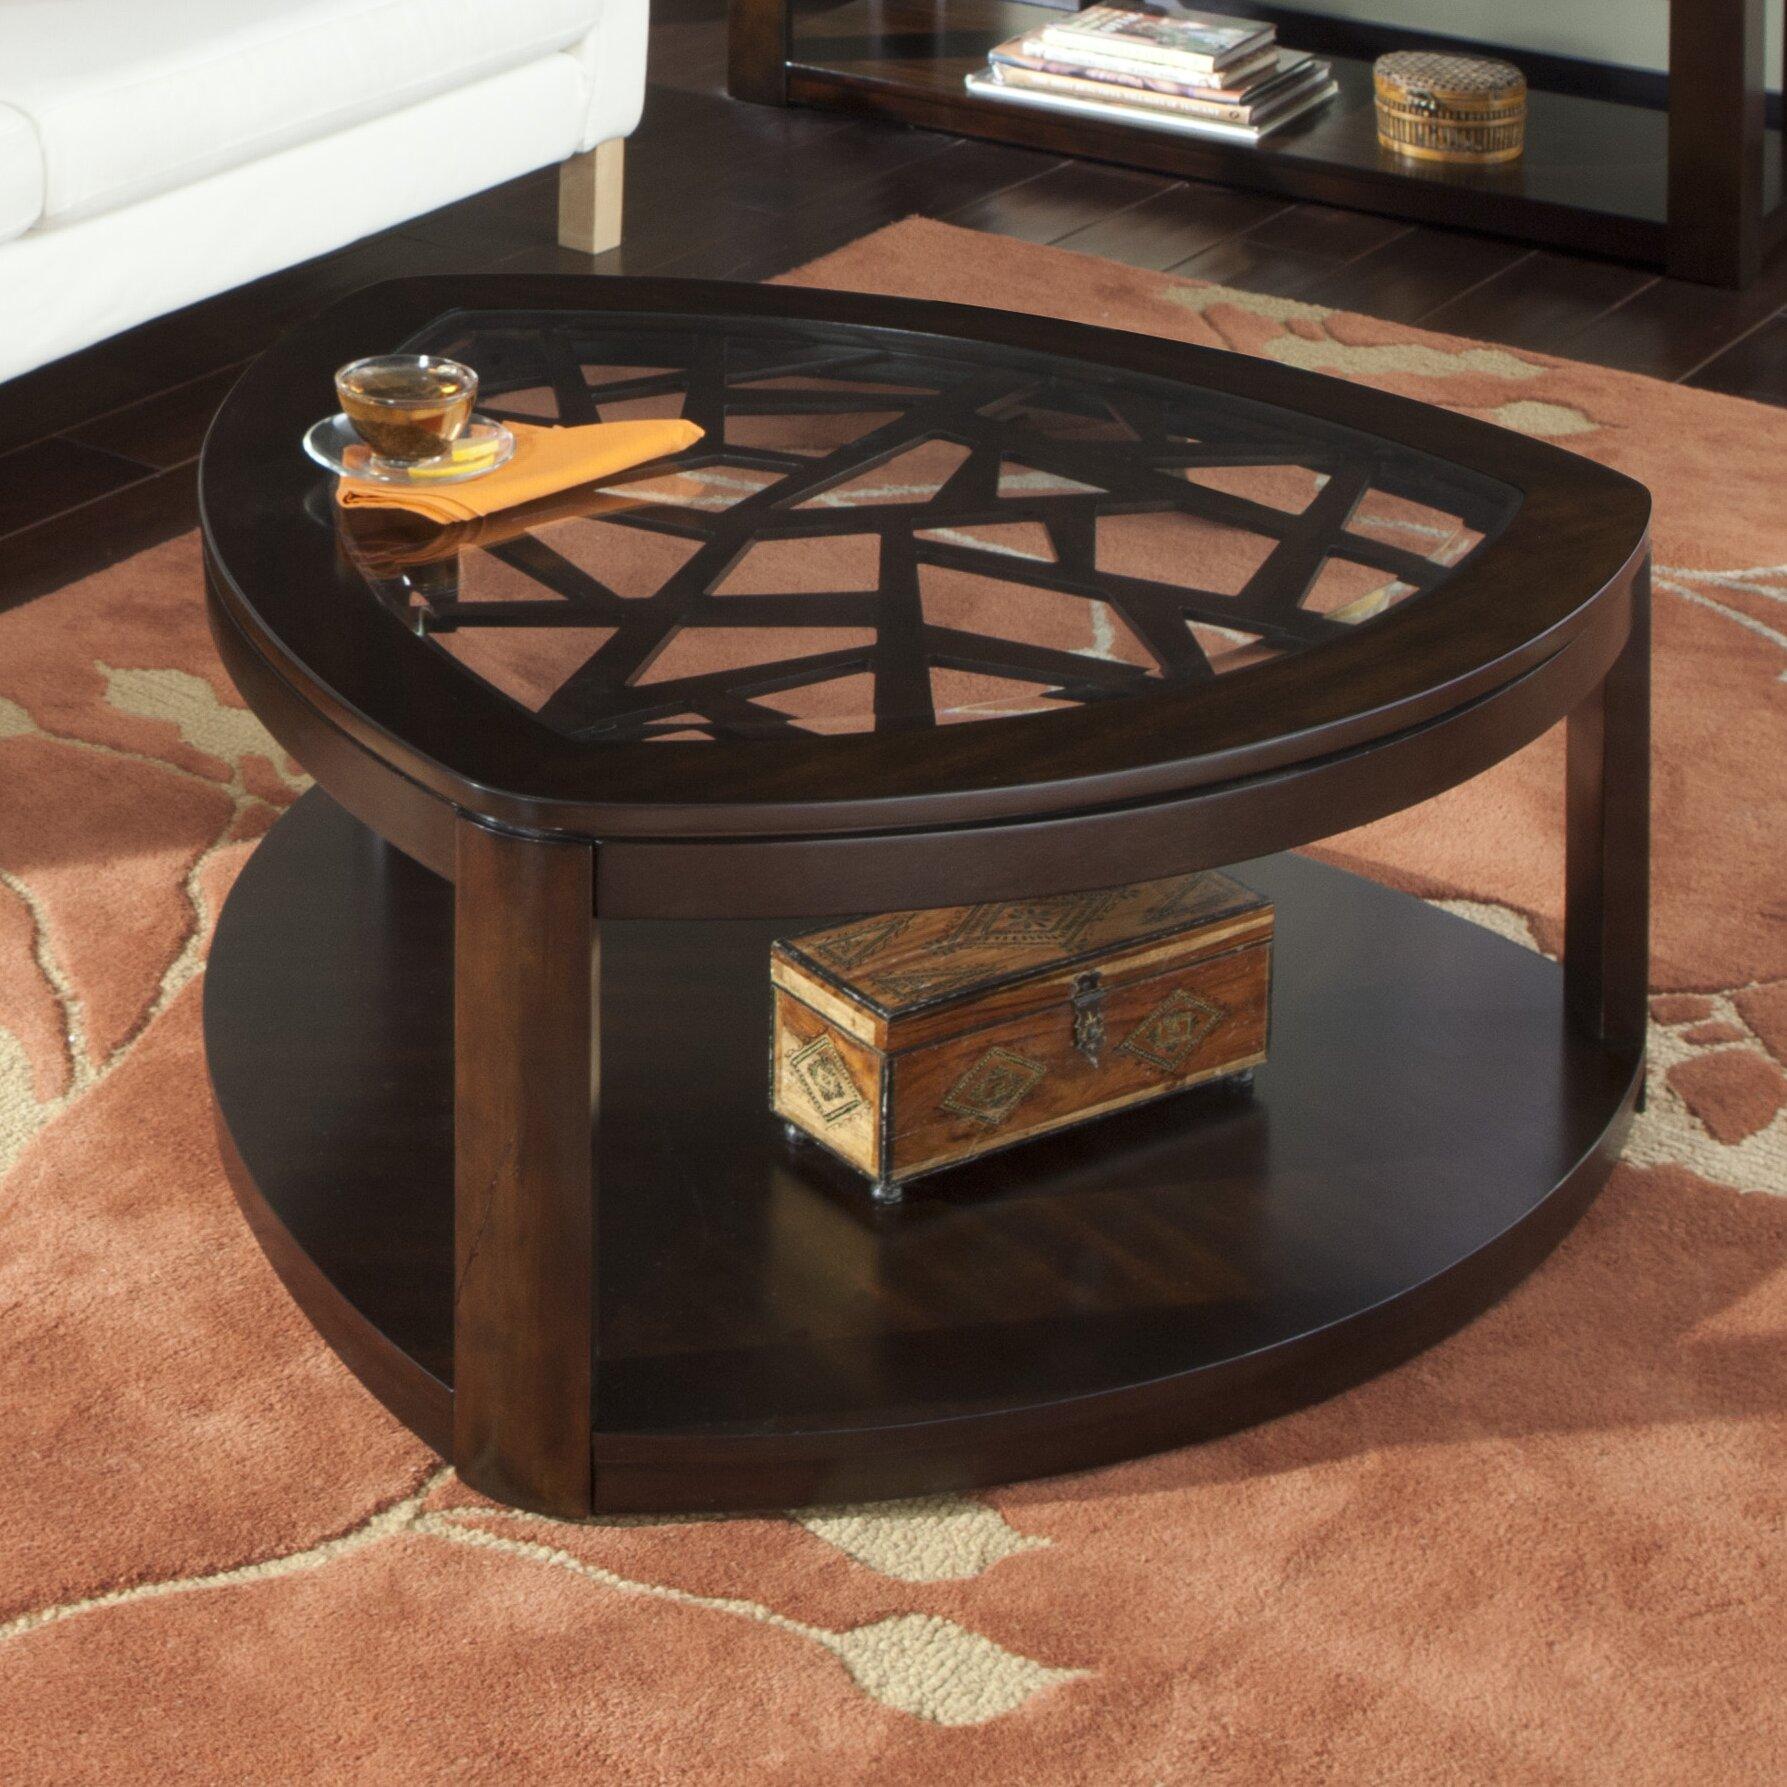 Standard Furniture Crackle Coffee Table Reviews Wayfair